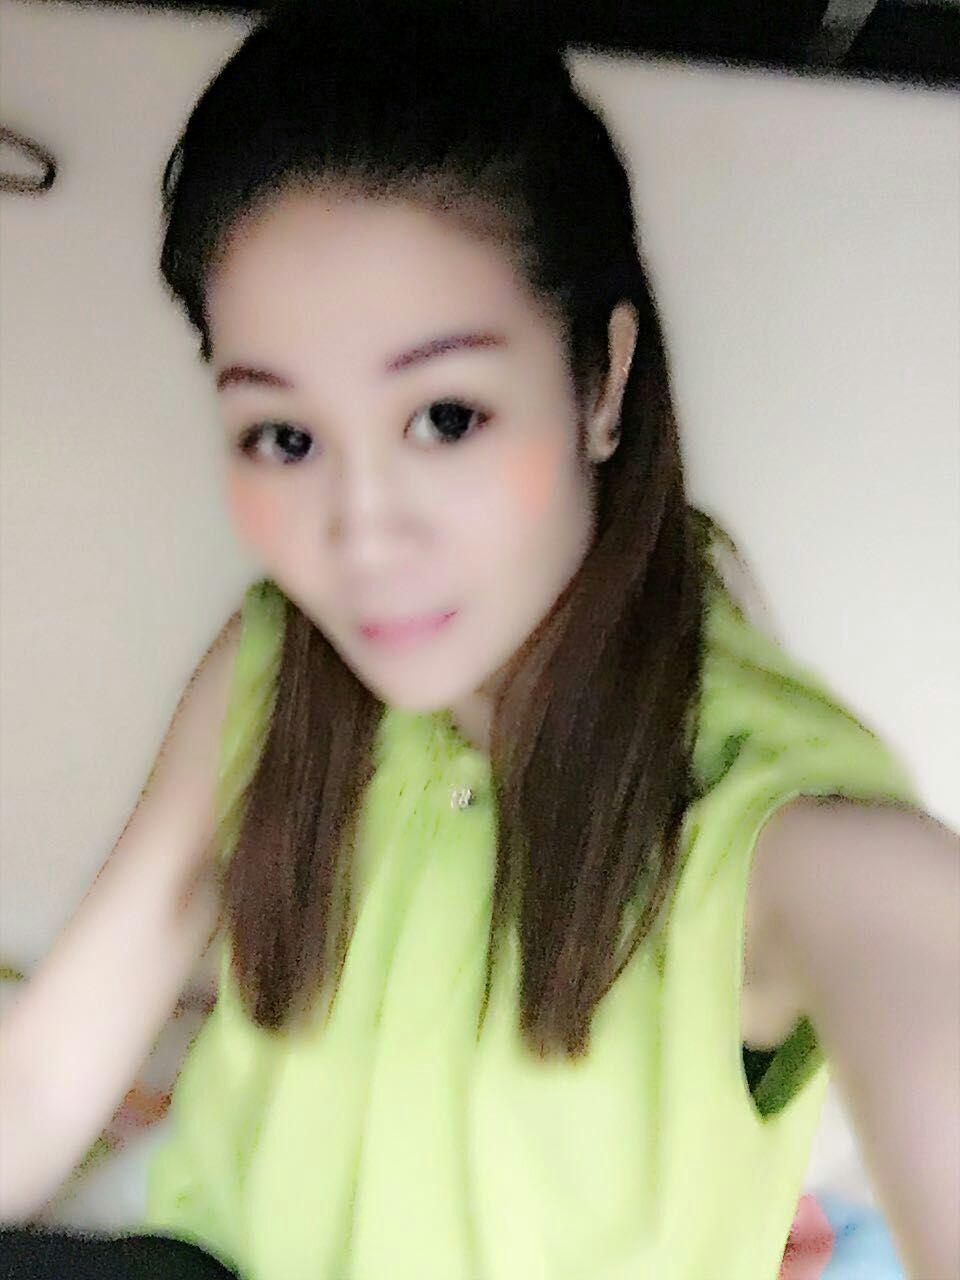 Alice, nordkoreansk escort i Al Manama 4-5865